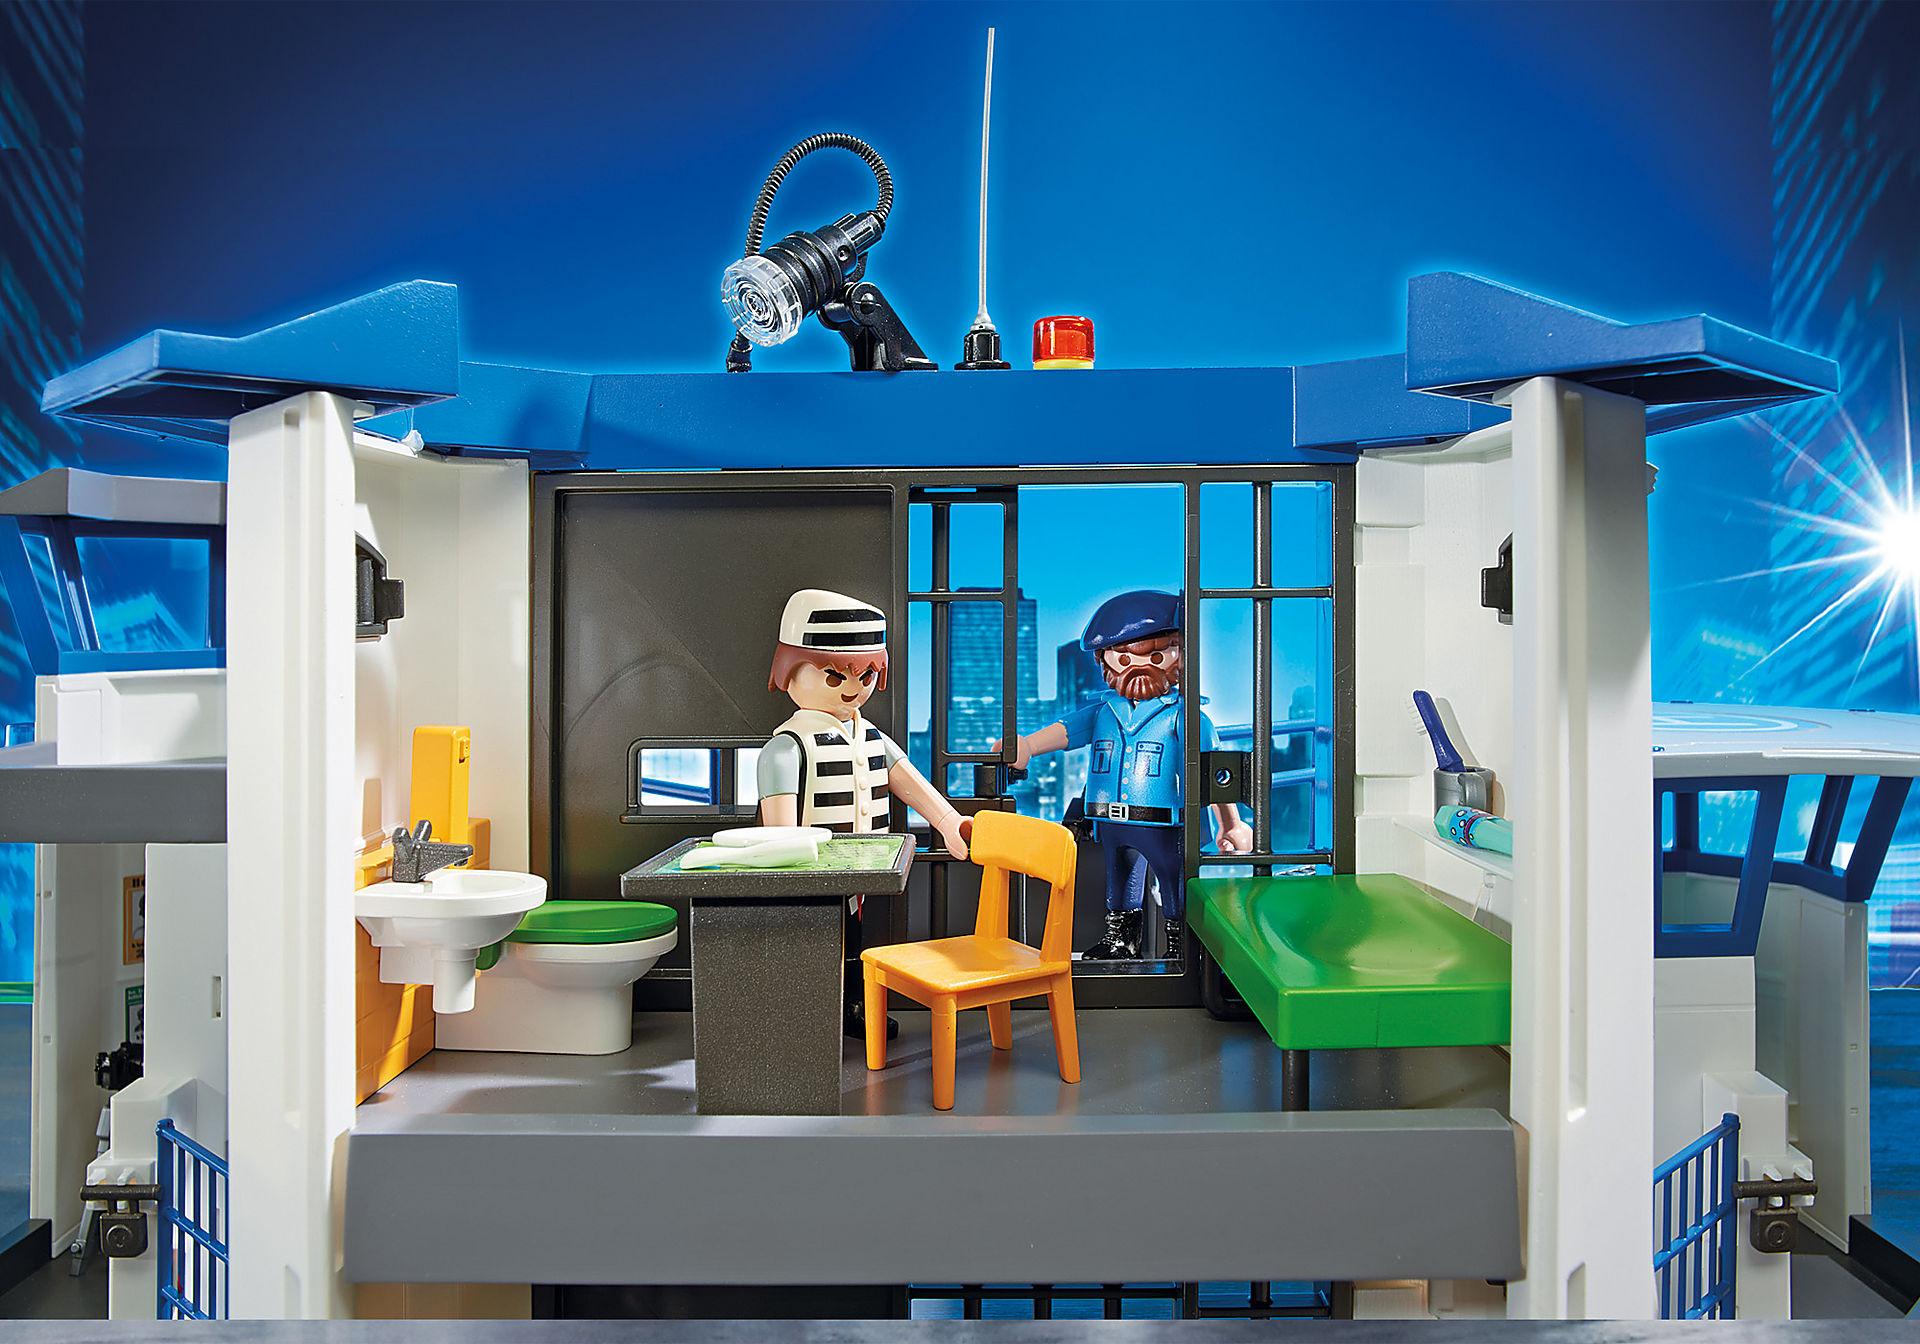 http://media.playmobil.com/i/playmobil/6919_product_extra4/Int. Polizei-Kommandozentrale mit Gefängnis